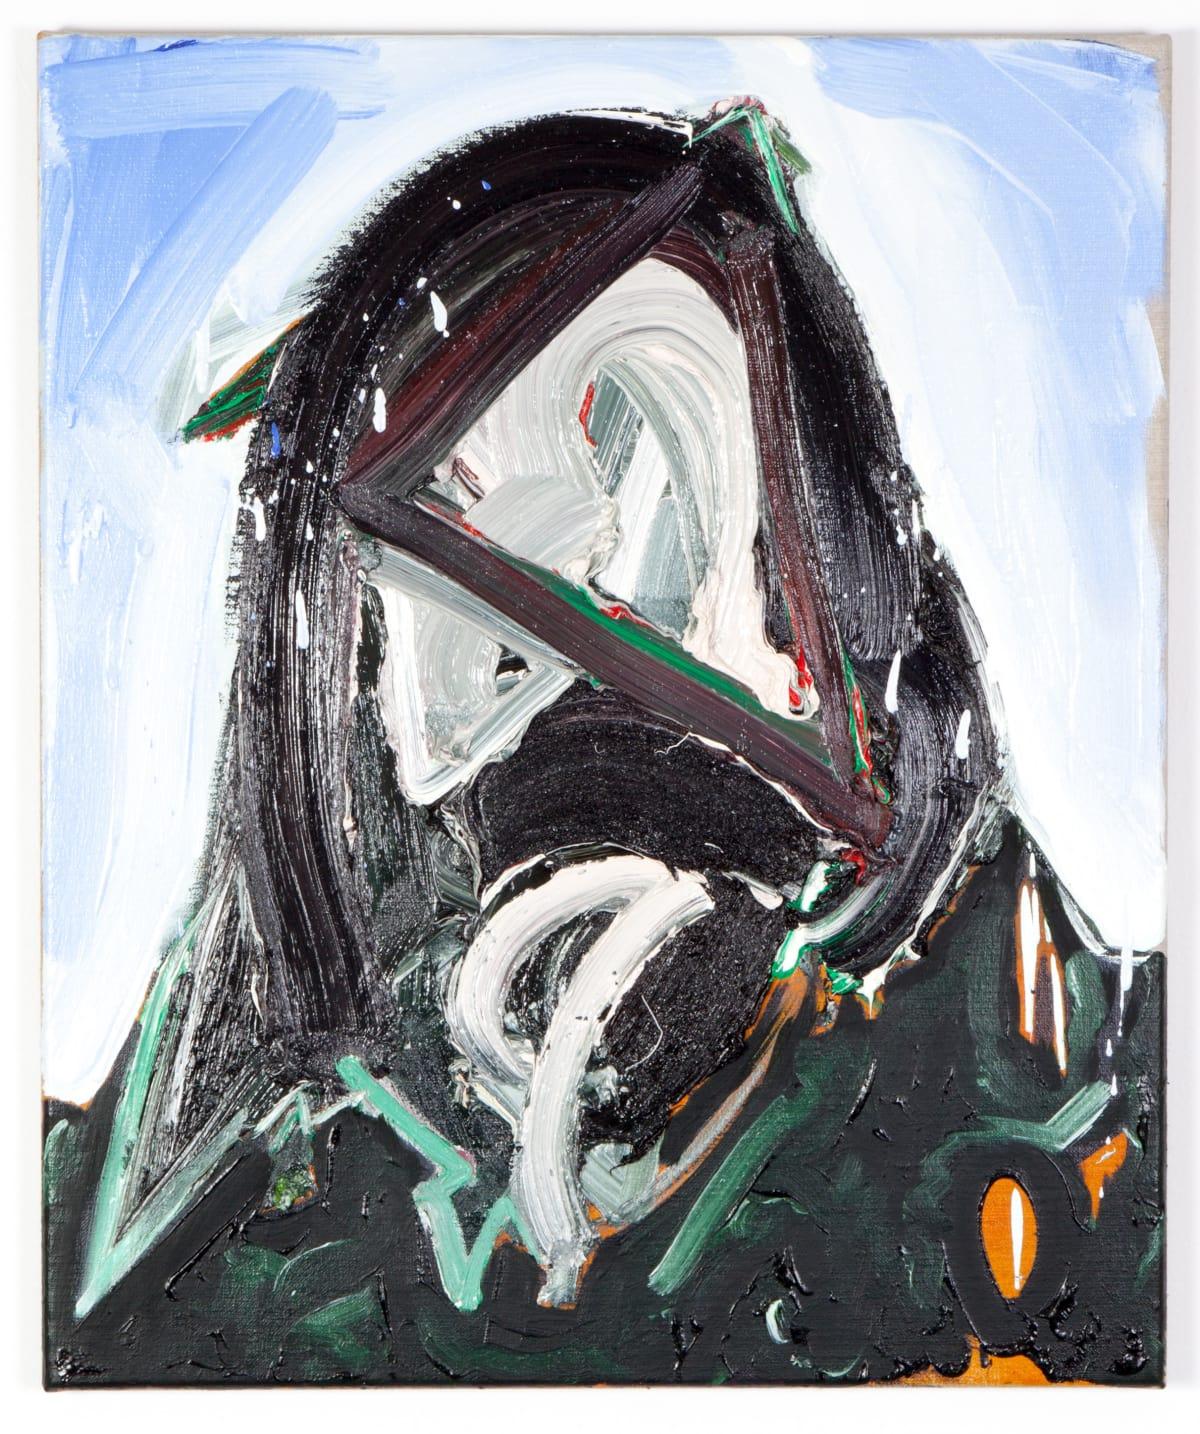 Toby Raine Ozzy with Beard, Holland 1975, 2015 Oil on linen 23.8 x 19.9 in 60.5 x 50.5 cm